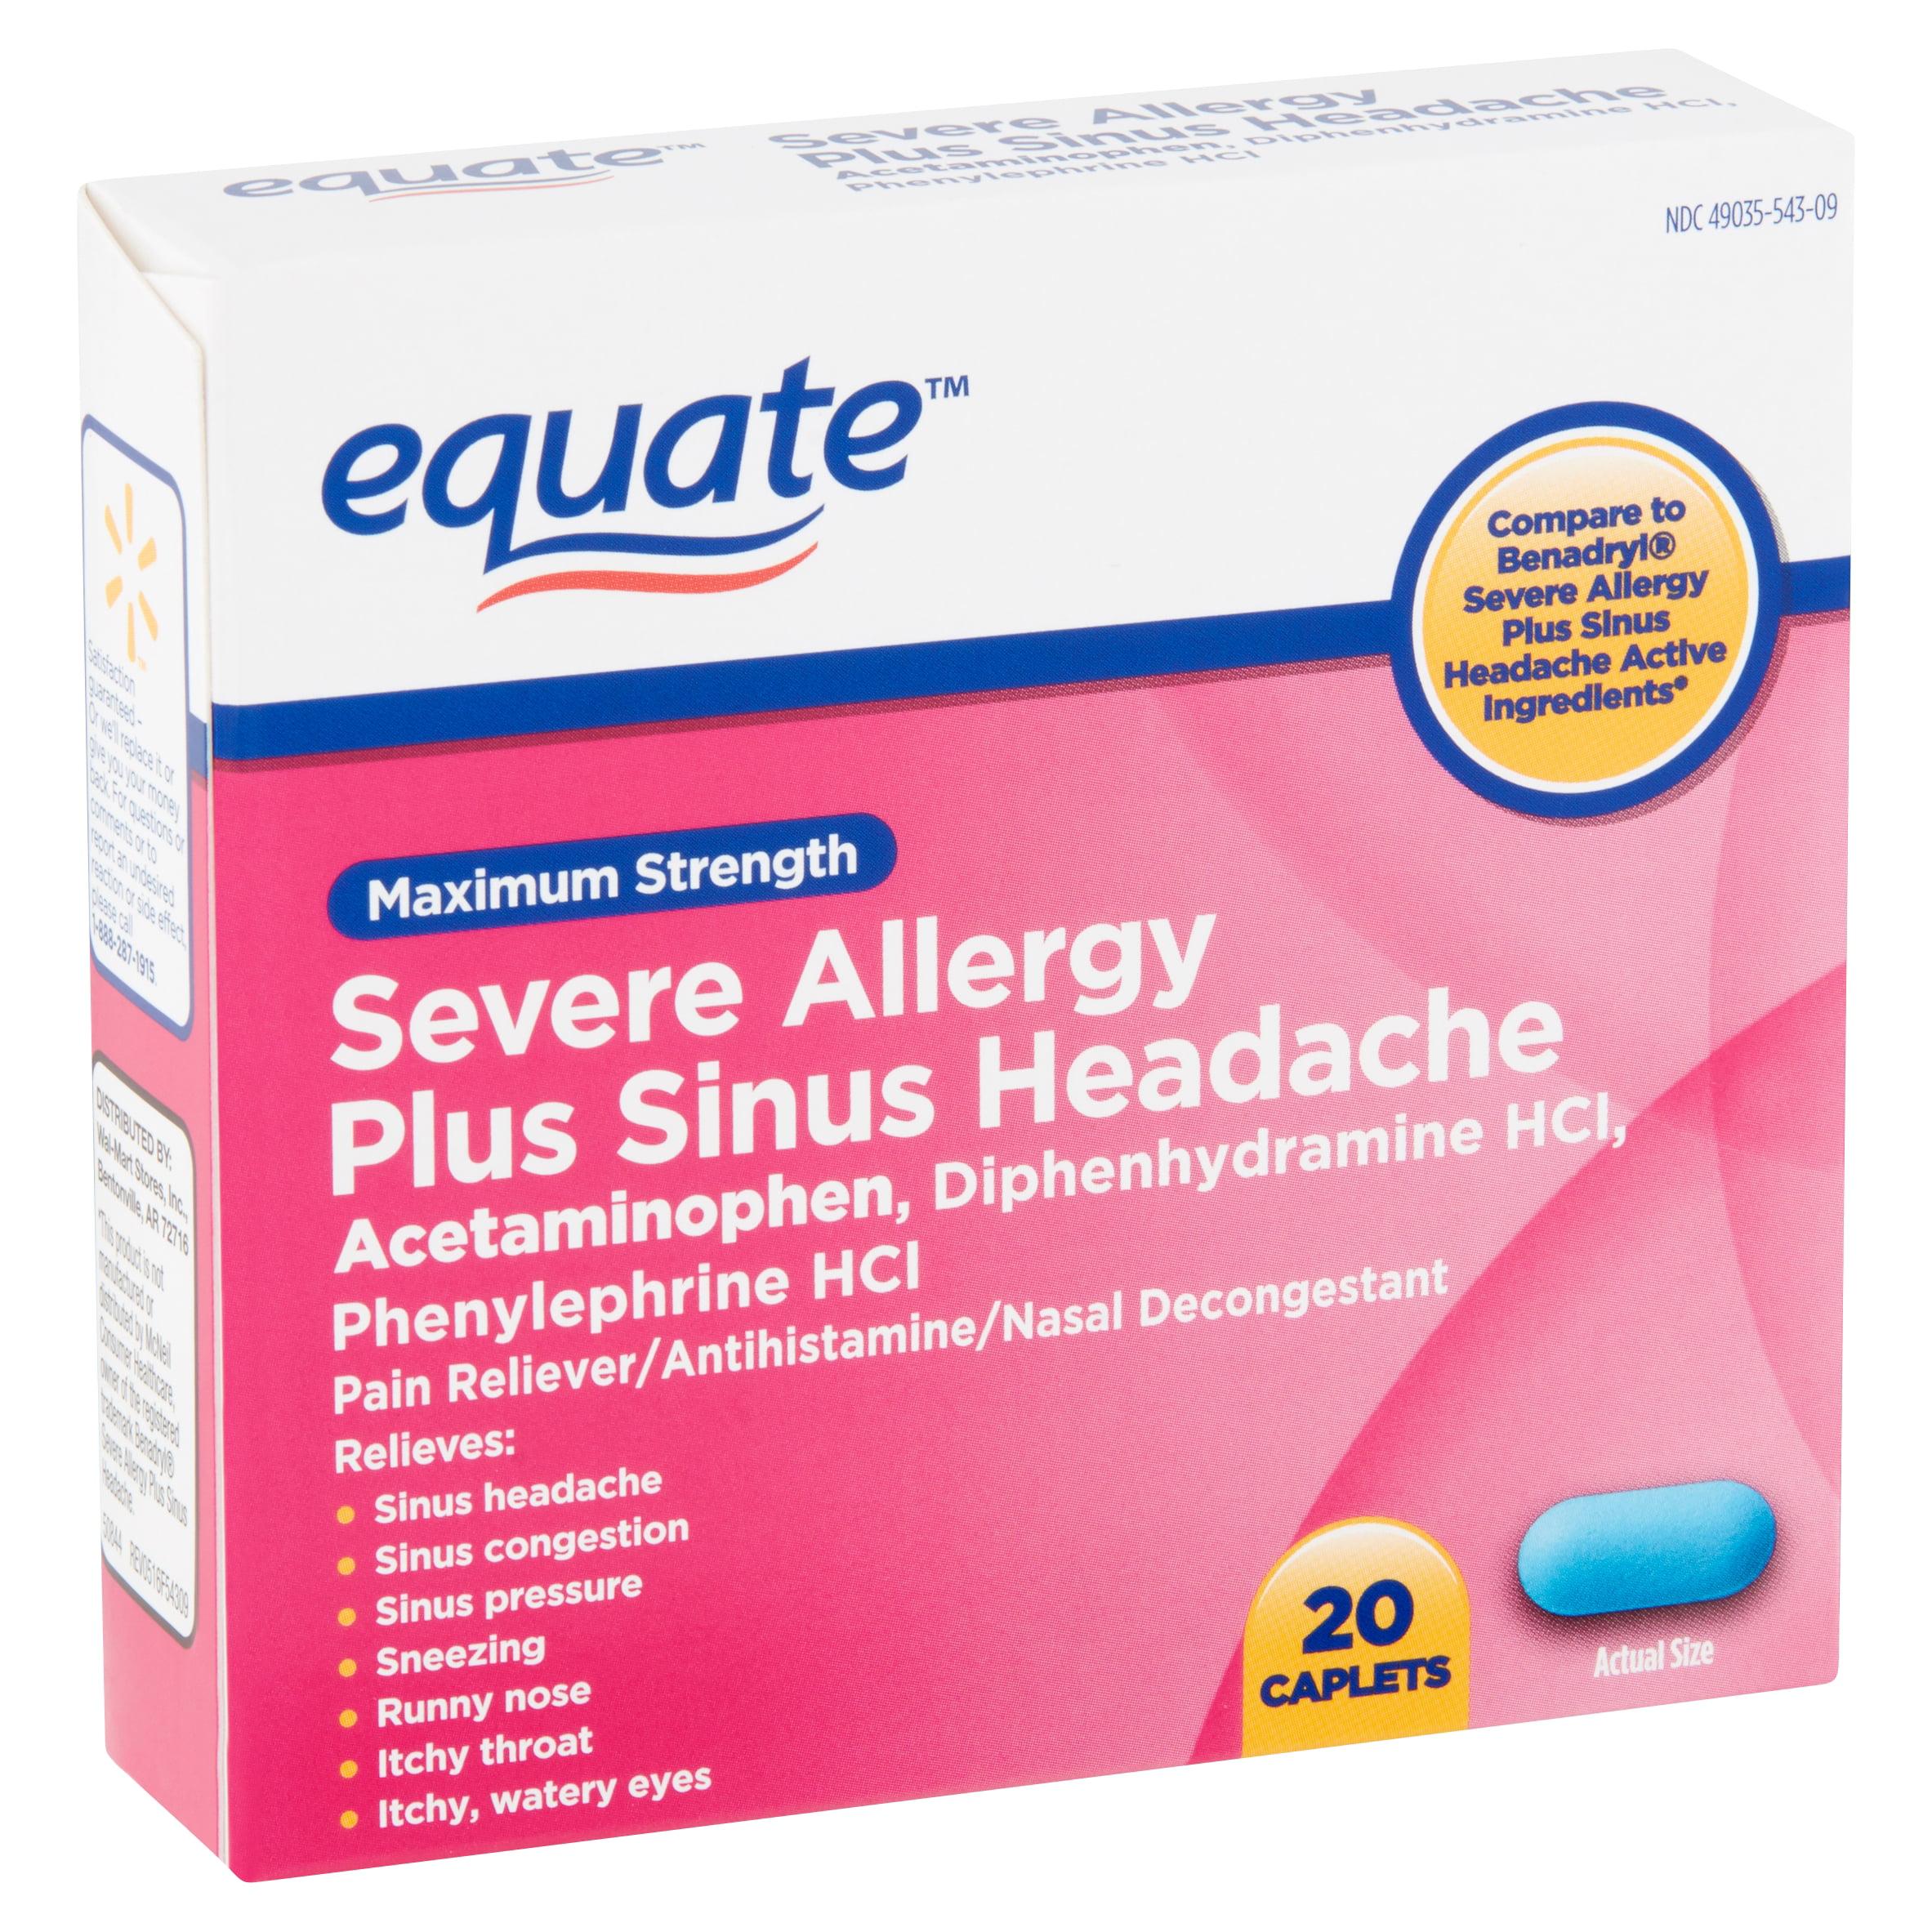 Equate Maximum Strength Severe Allergy Plus Sinus Headache Caplets, 20  count - Walmart.com